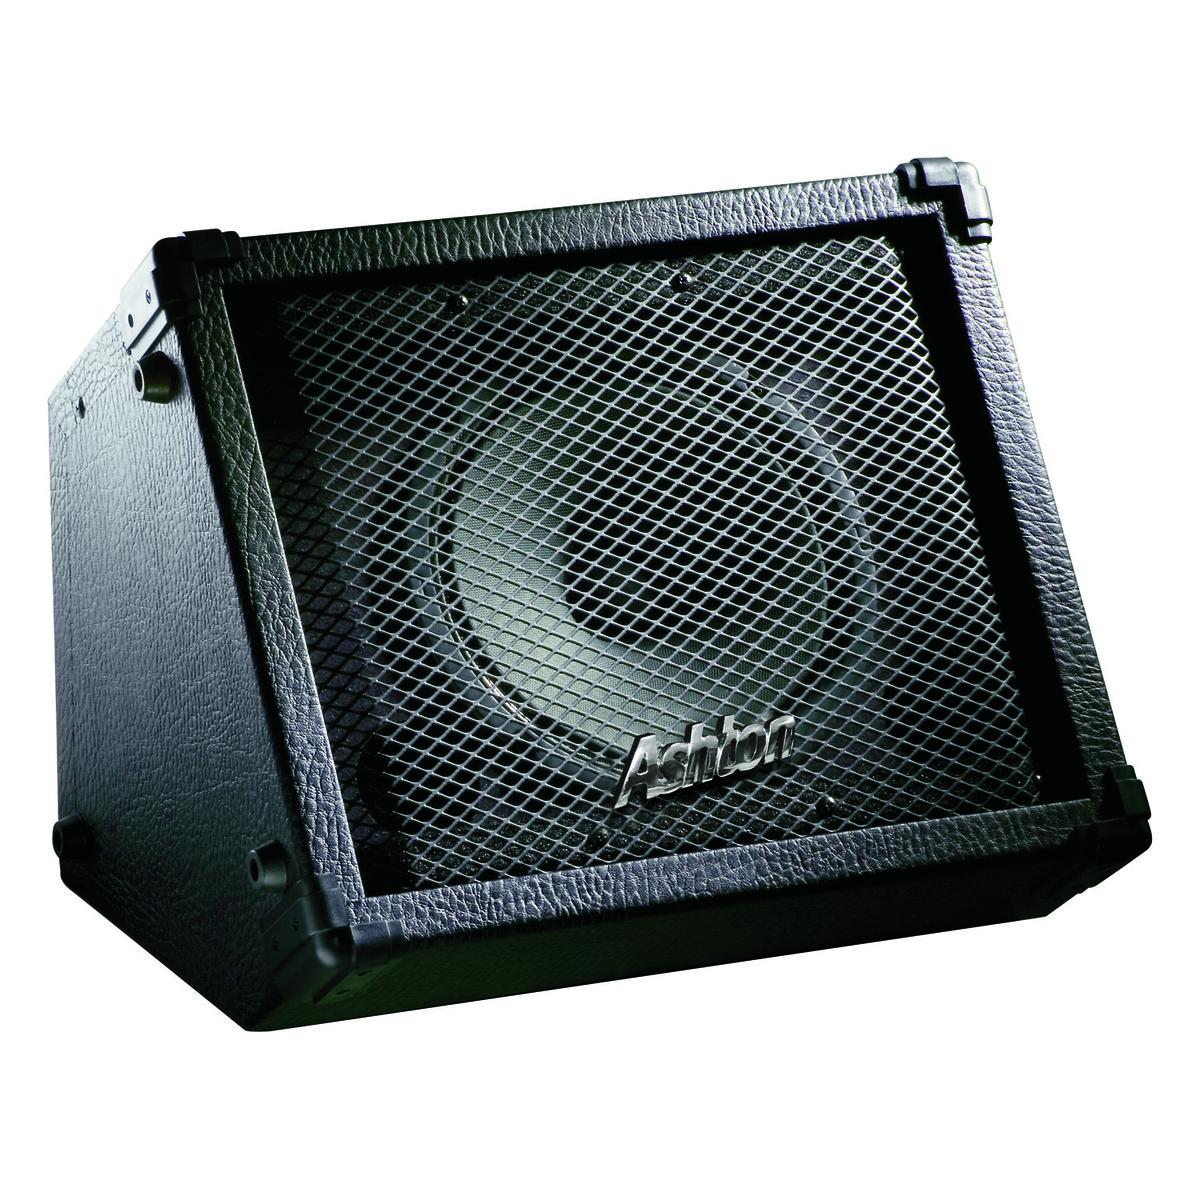 ashton bsk158 15 watt battery powered busking amp at gear4music. Black Bedroom Furniture Sets. Home Design Ideas